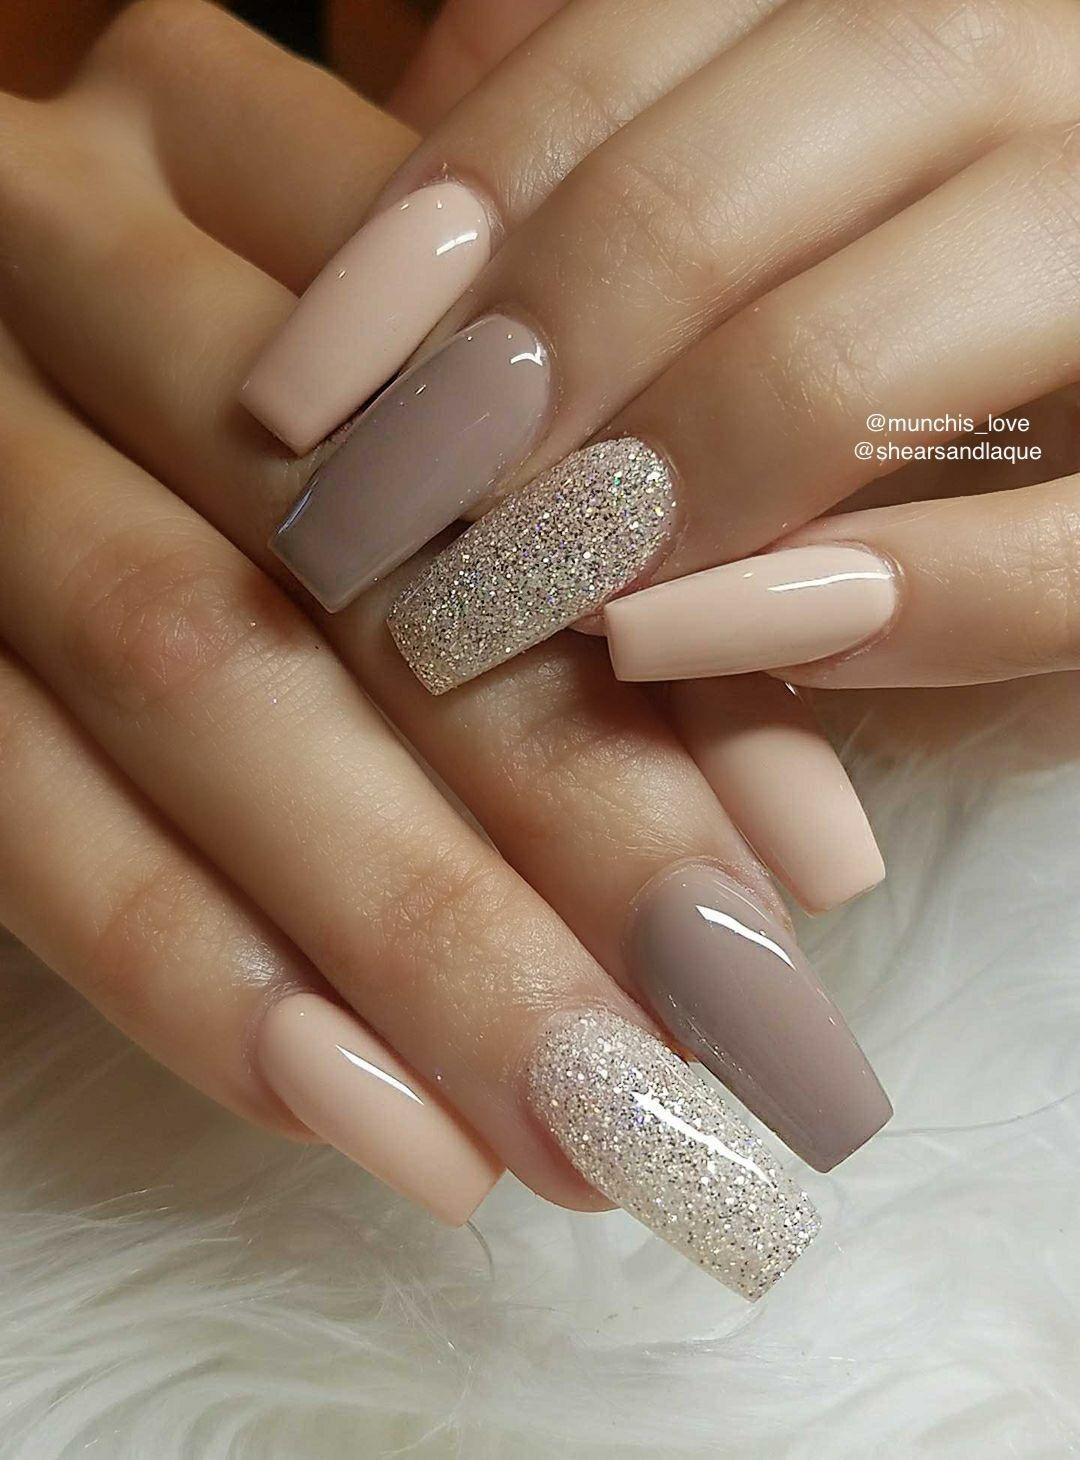 Pin By Monika Iskova On Unhas Neutral Nail Designs Neutral Nails Gorgeous Nails